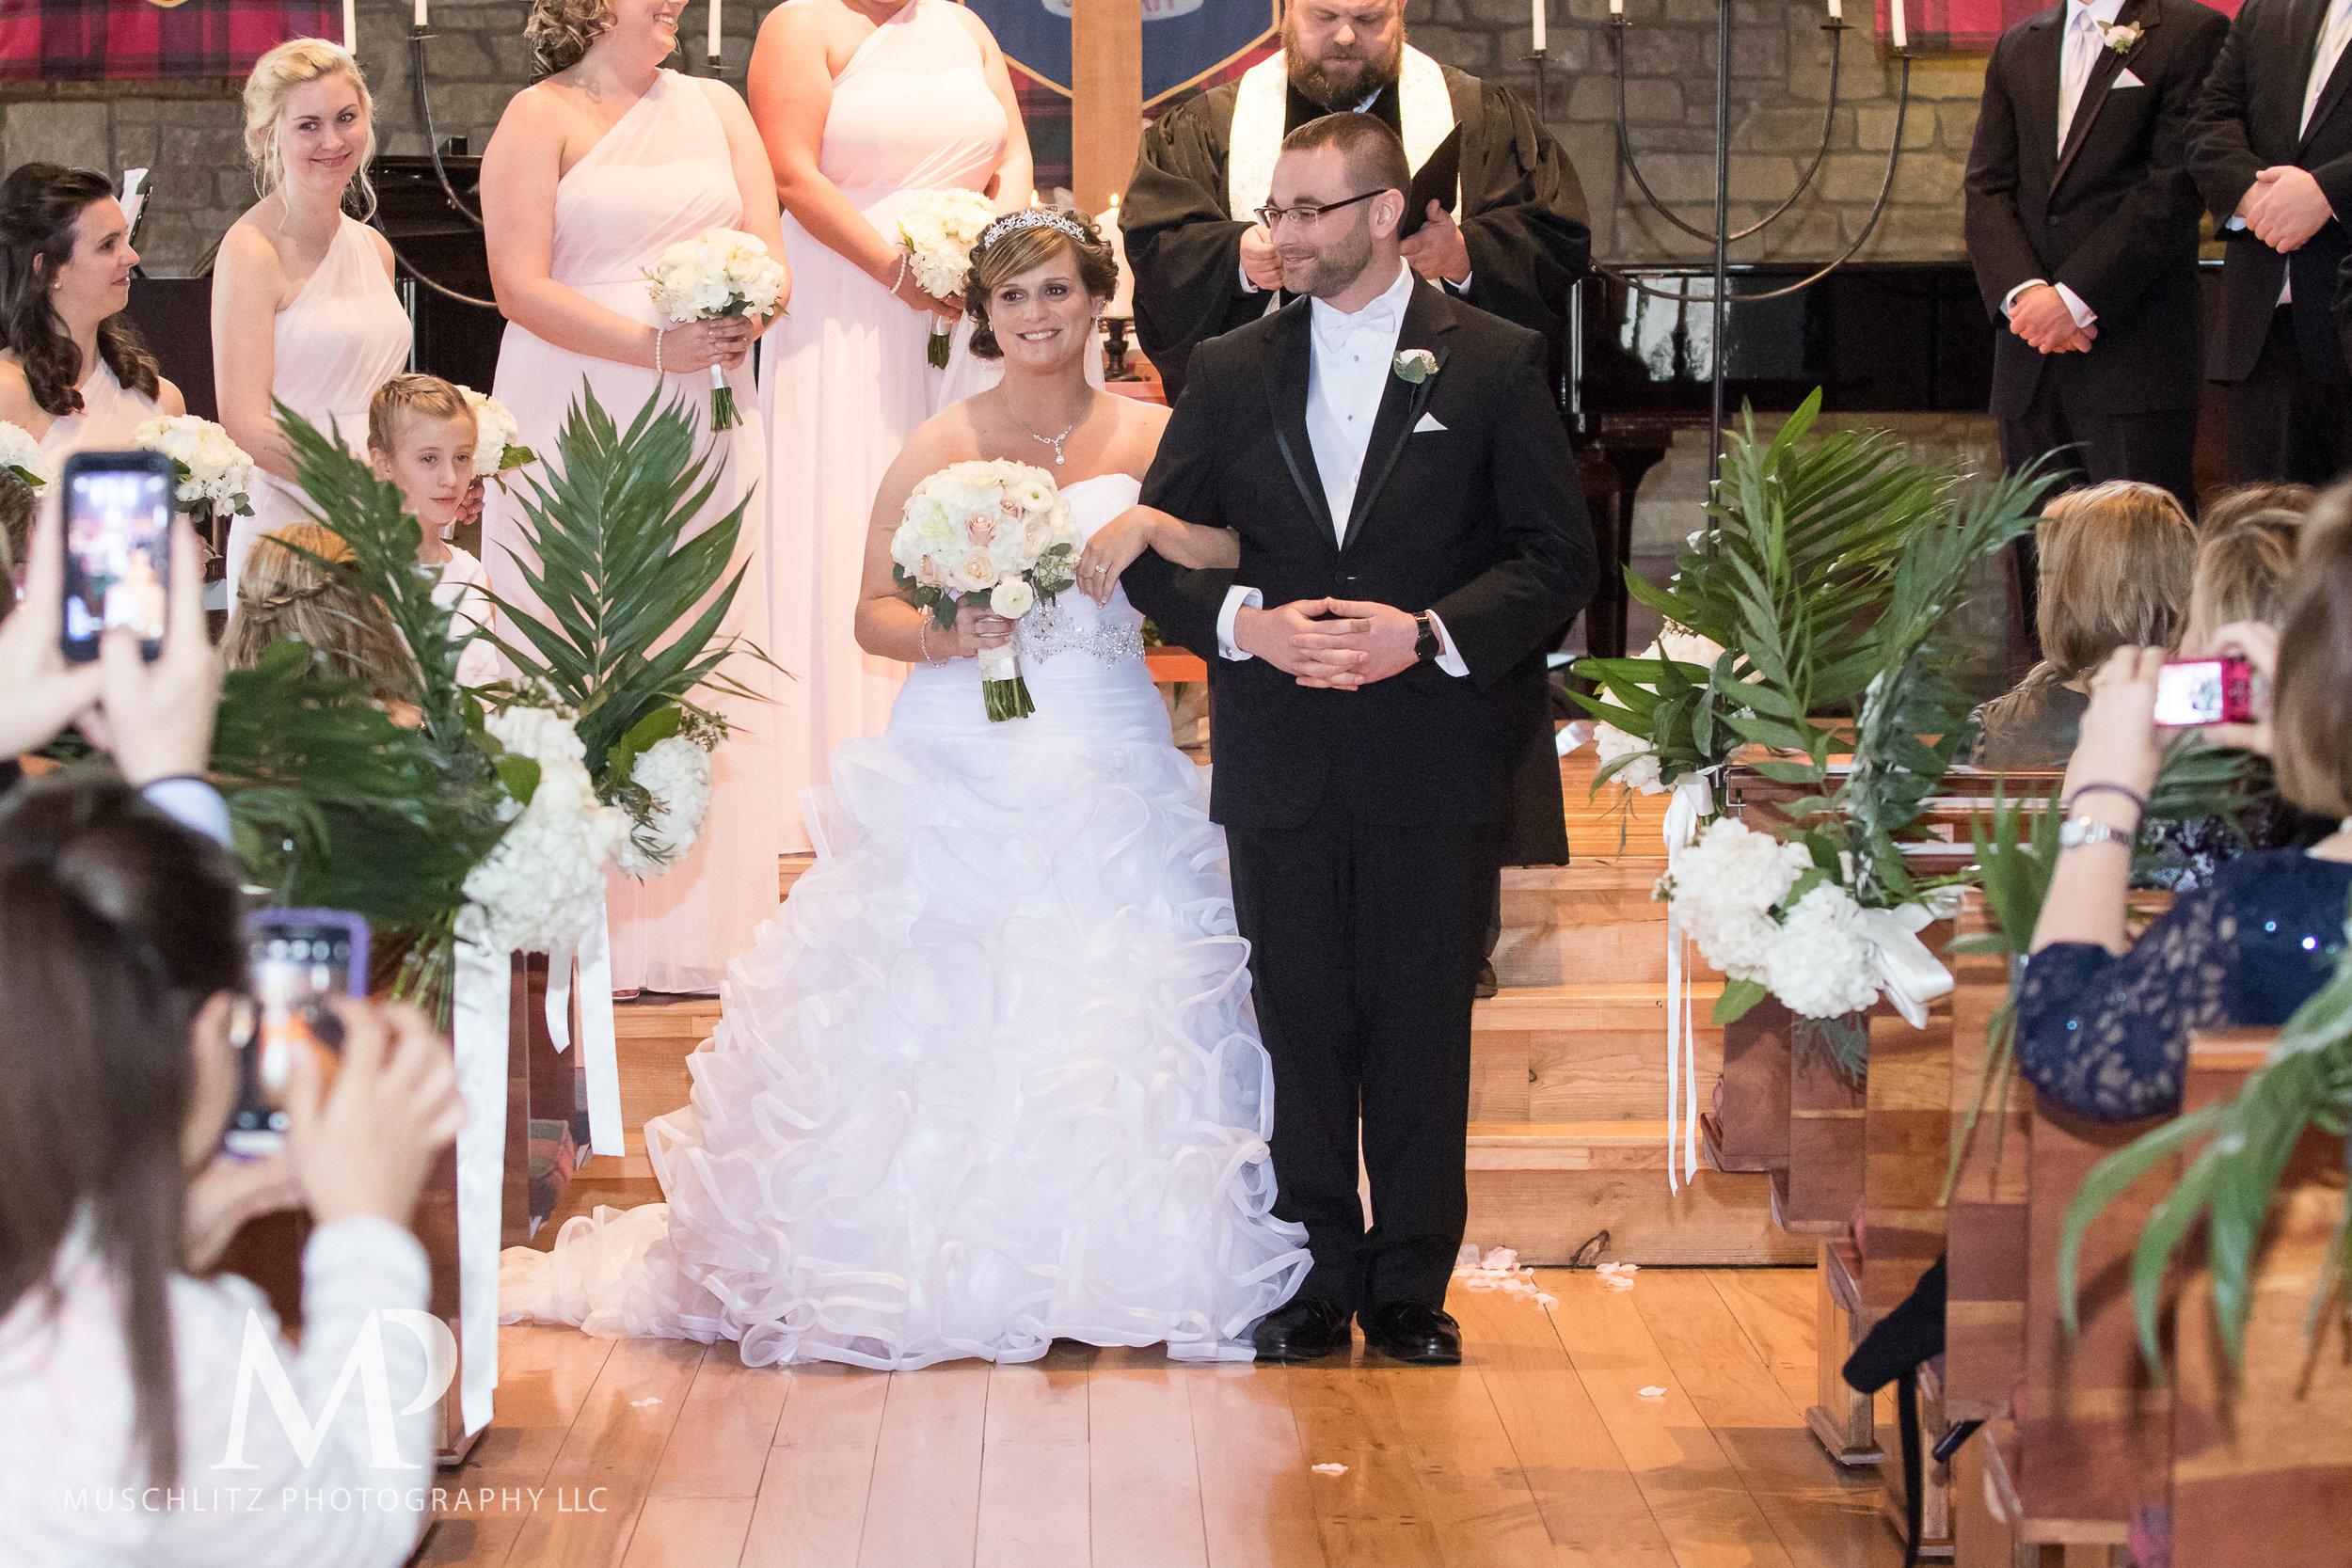 liberty-barn-presbyterian-church-wedding-delaware-columbus-ohio-muschlitz-photography-042.JPG